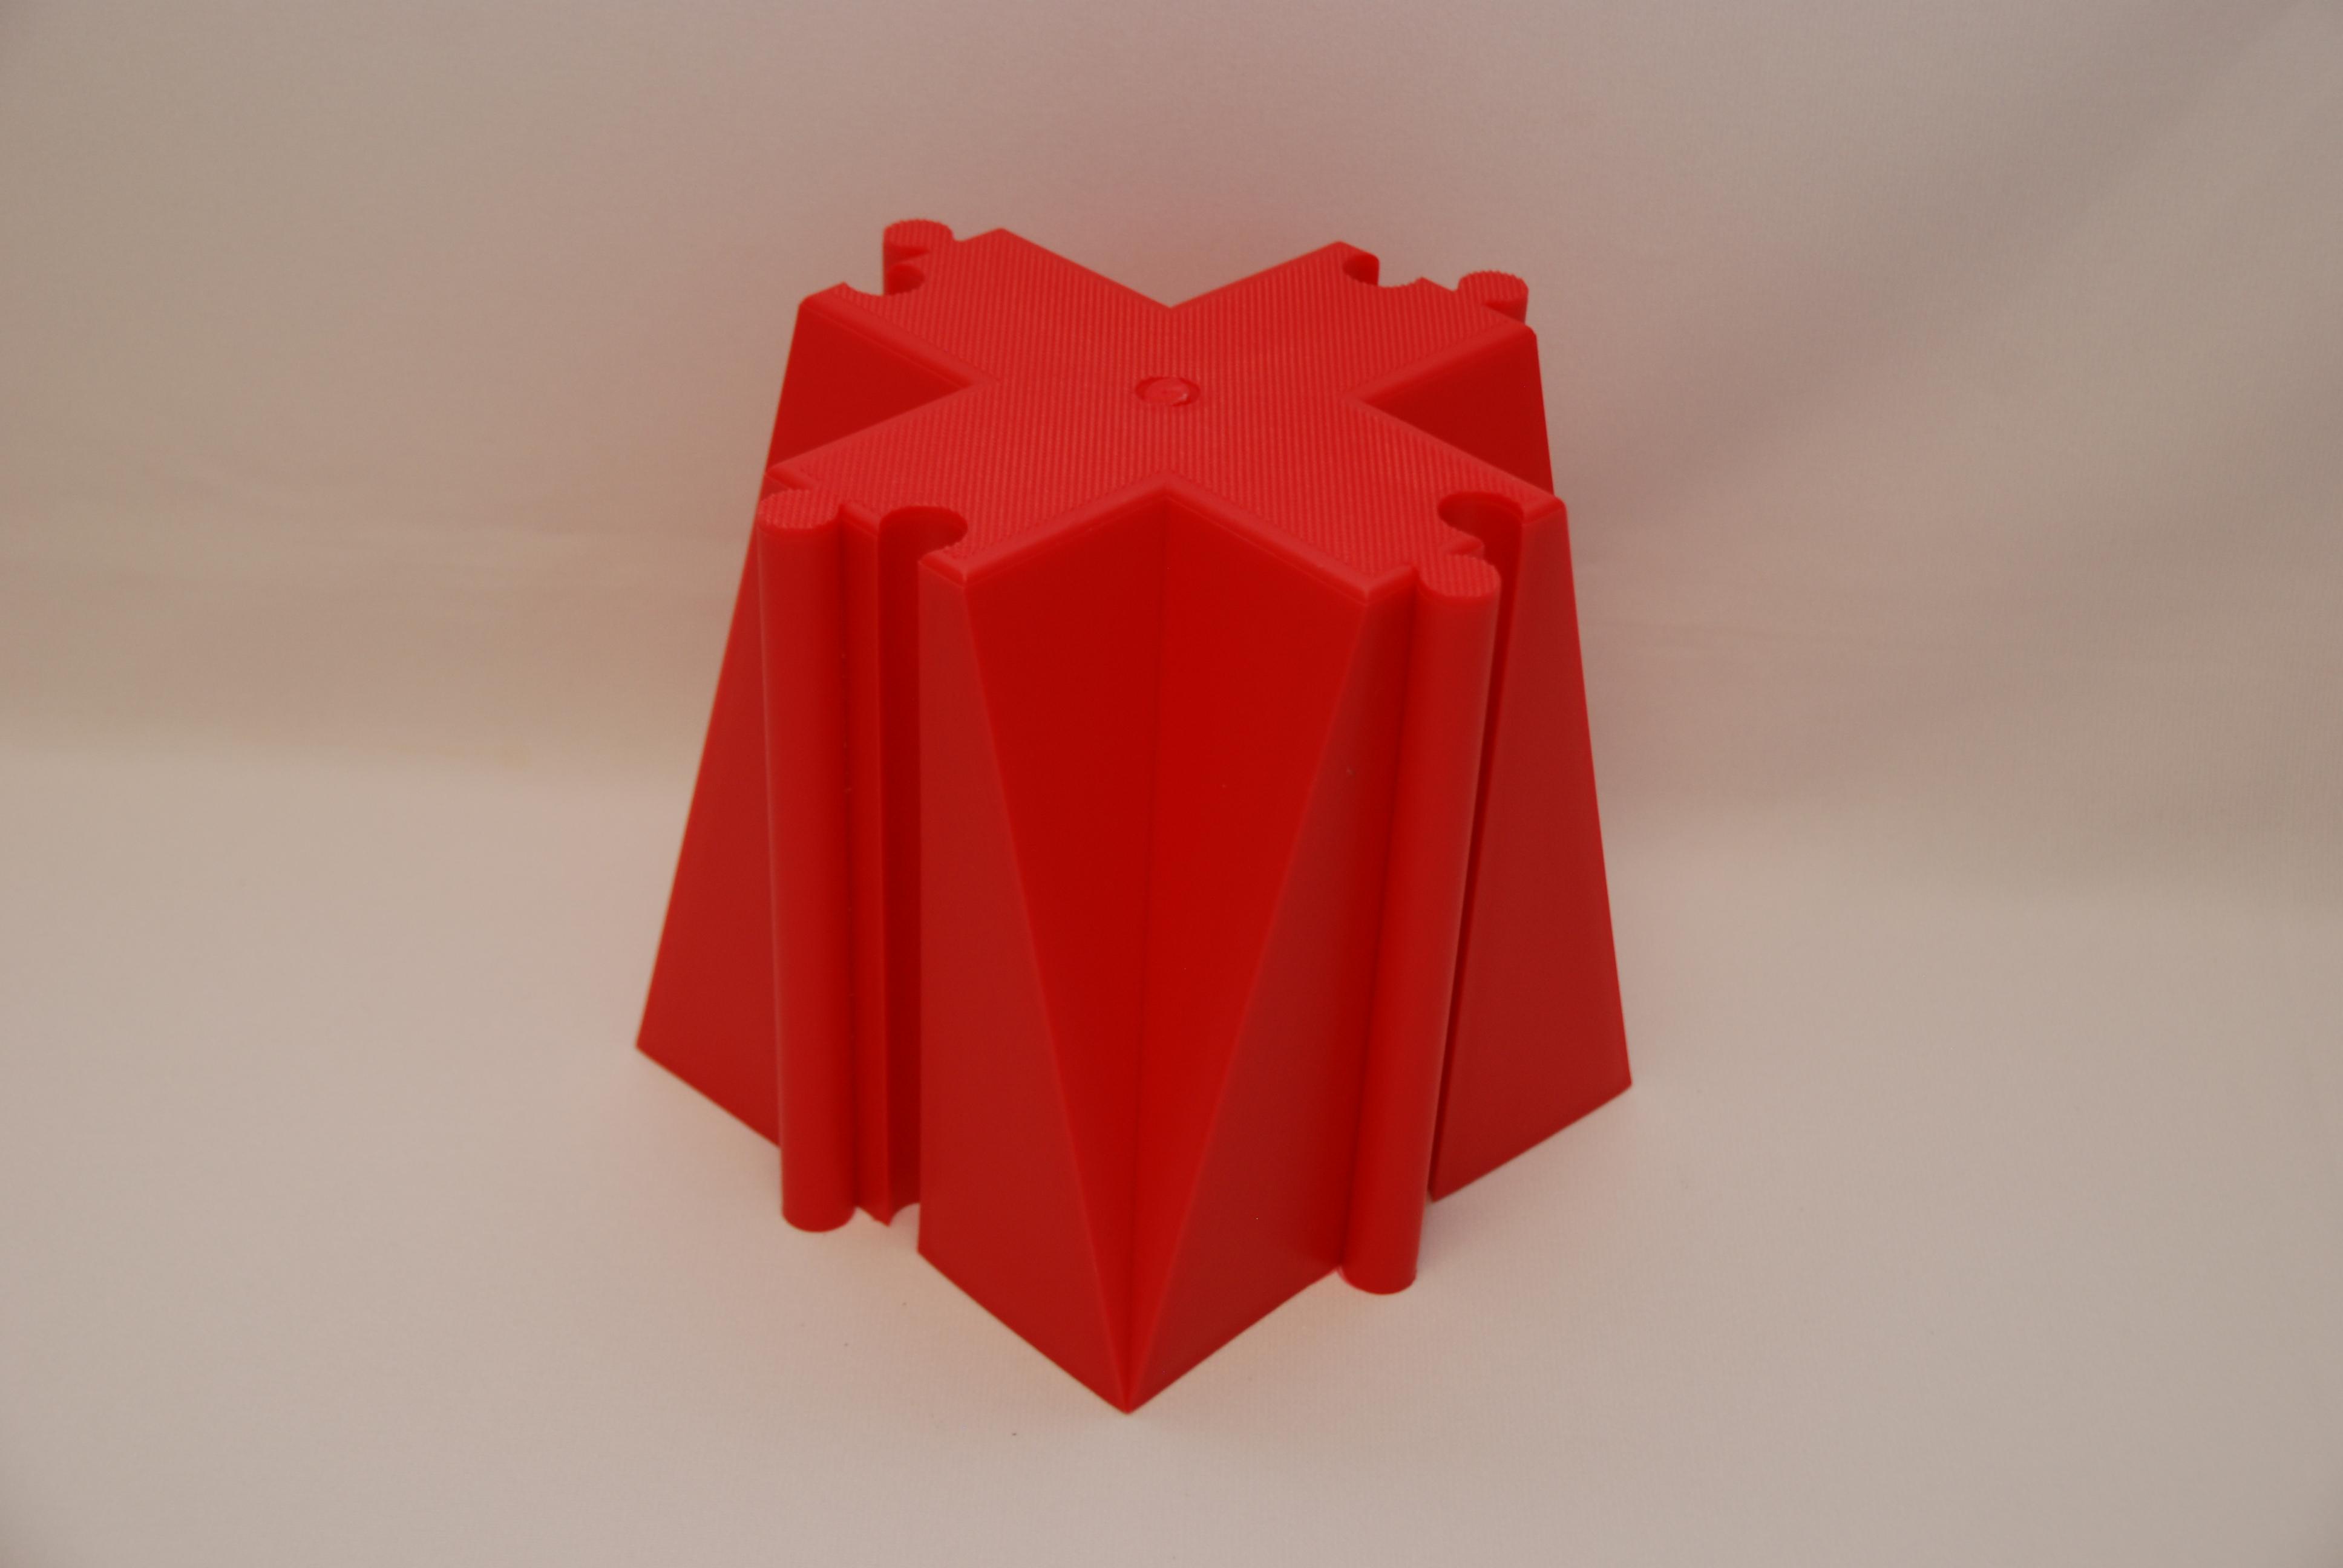 Everrich EVB-0066-2 Interconnector of Balance Beam - Red